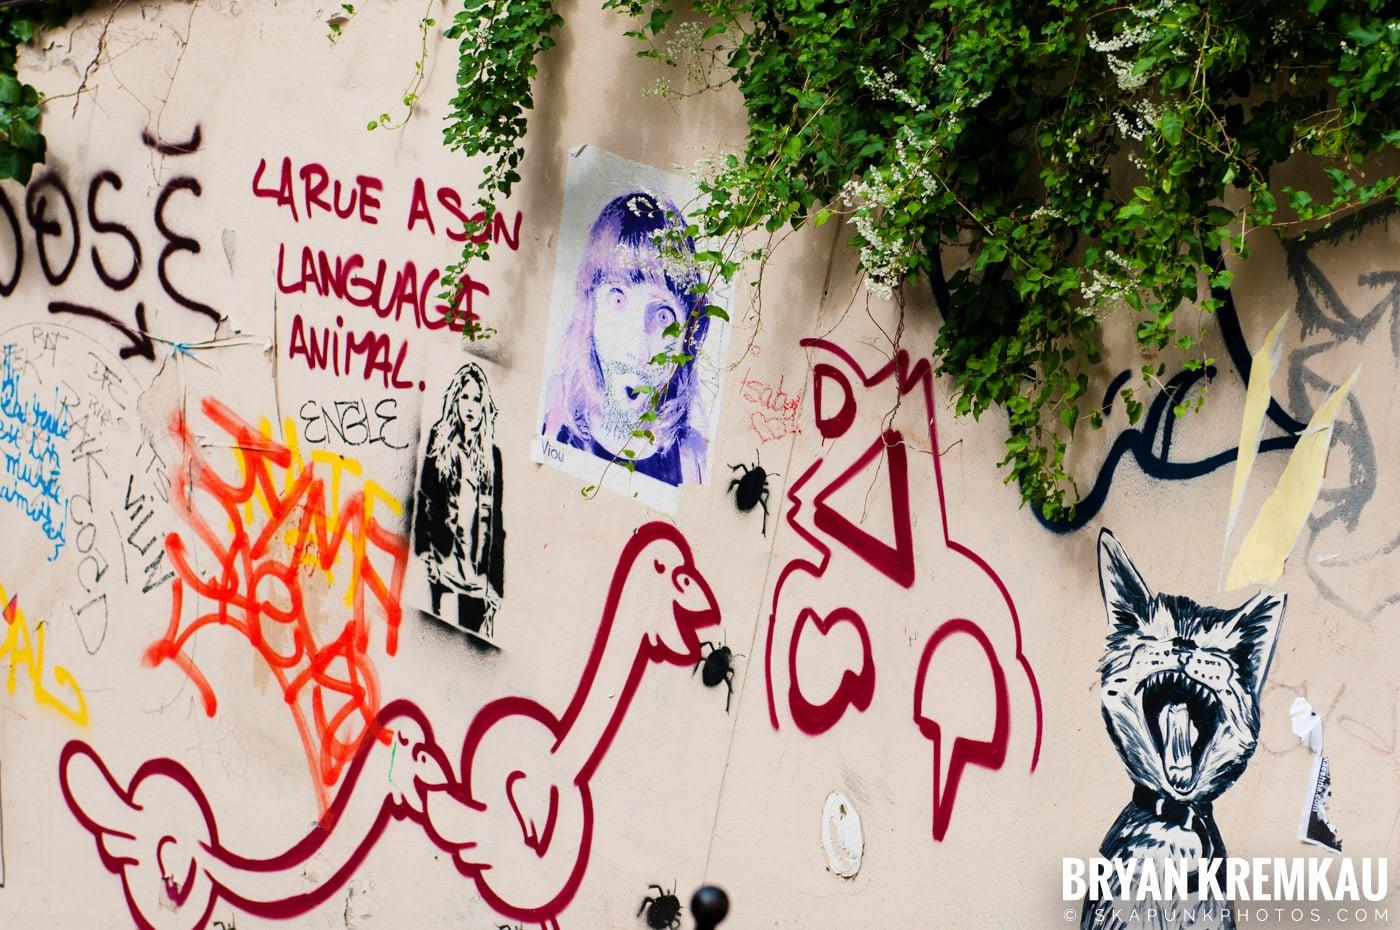 Paris, France Honeymoon - Day 6 - 7.23.11 (42)